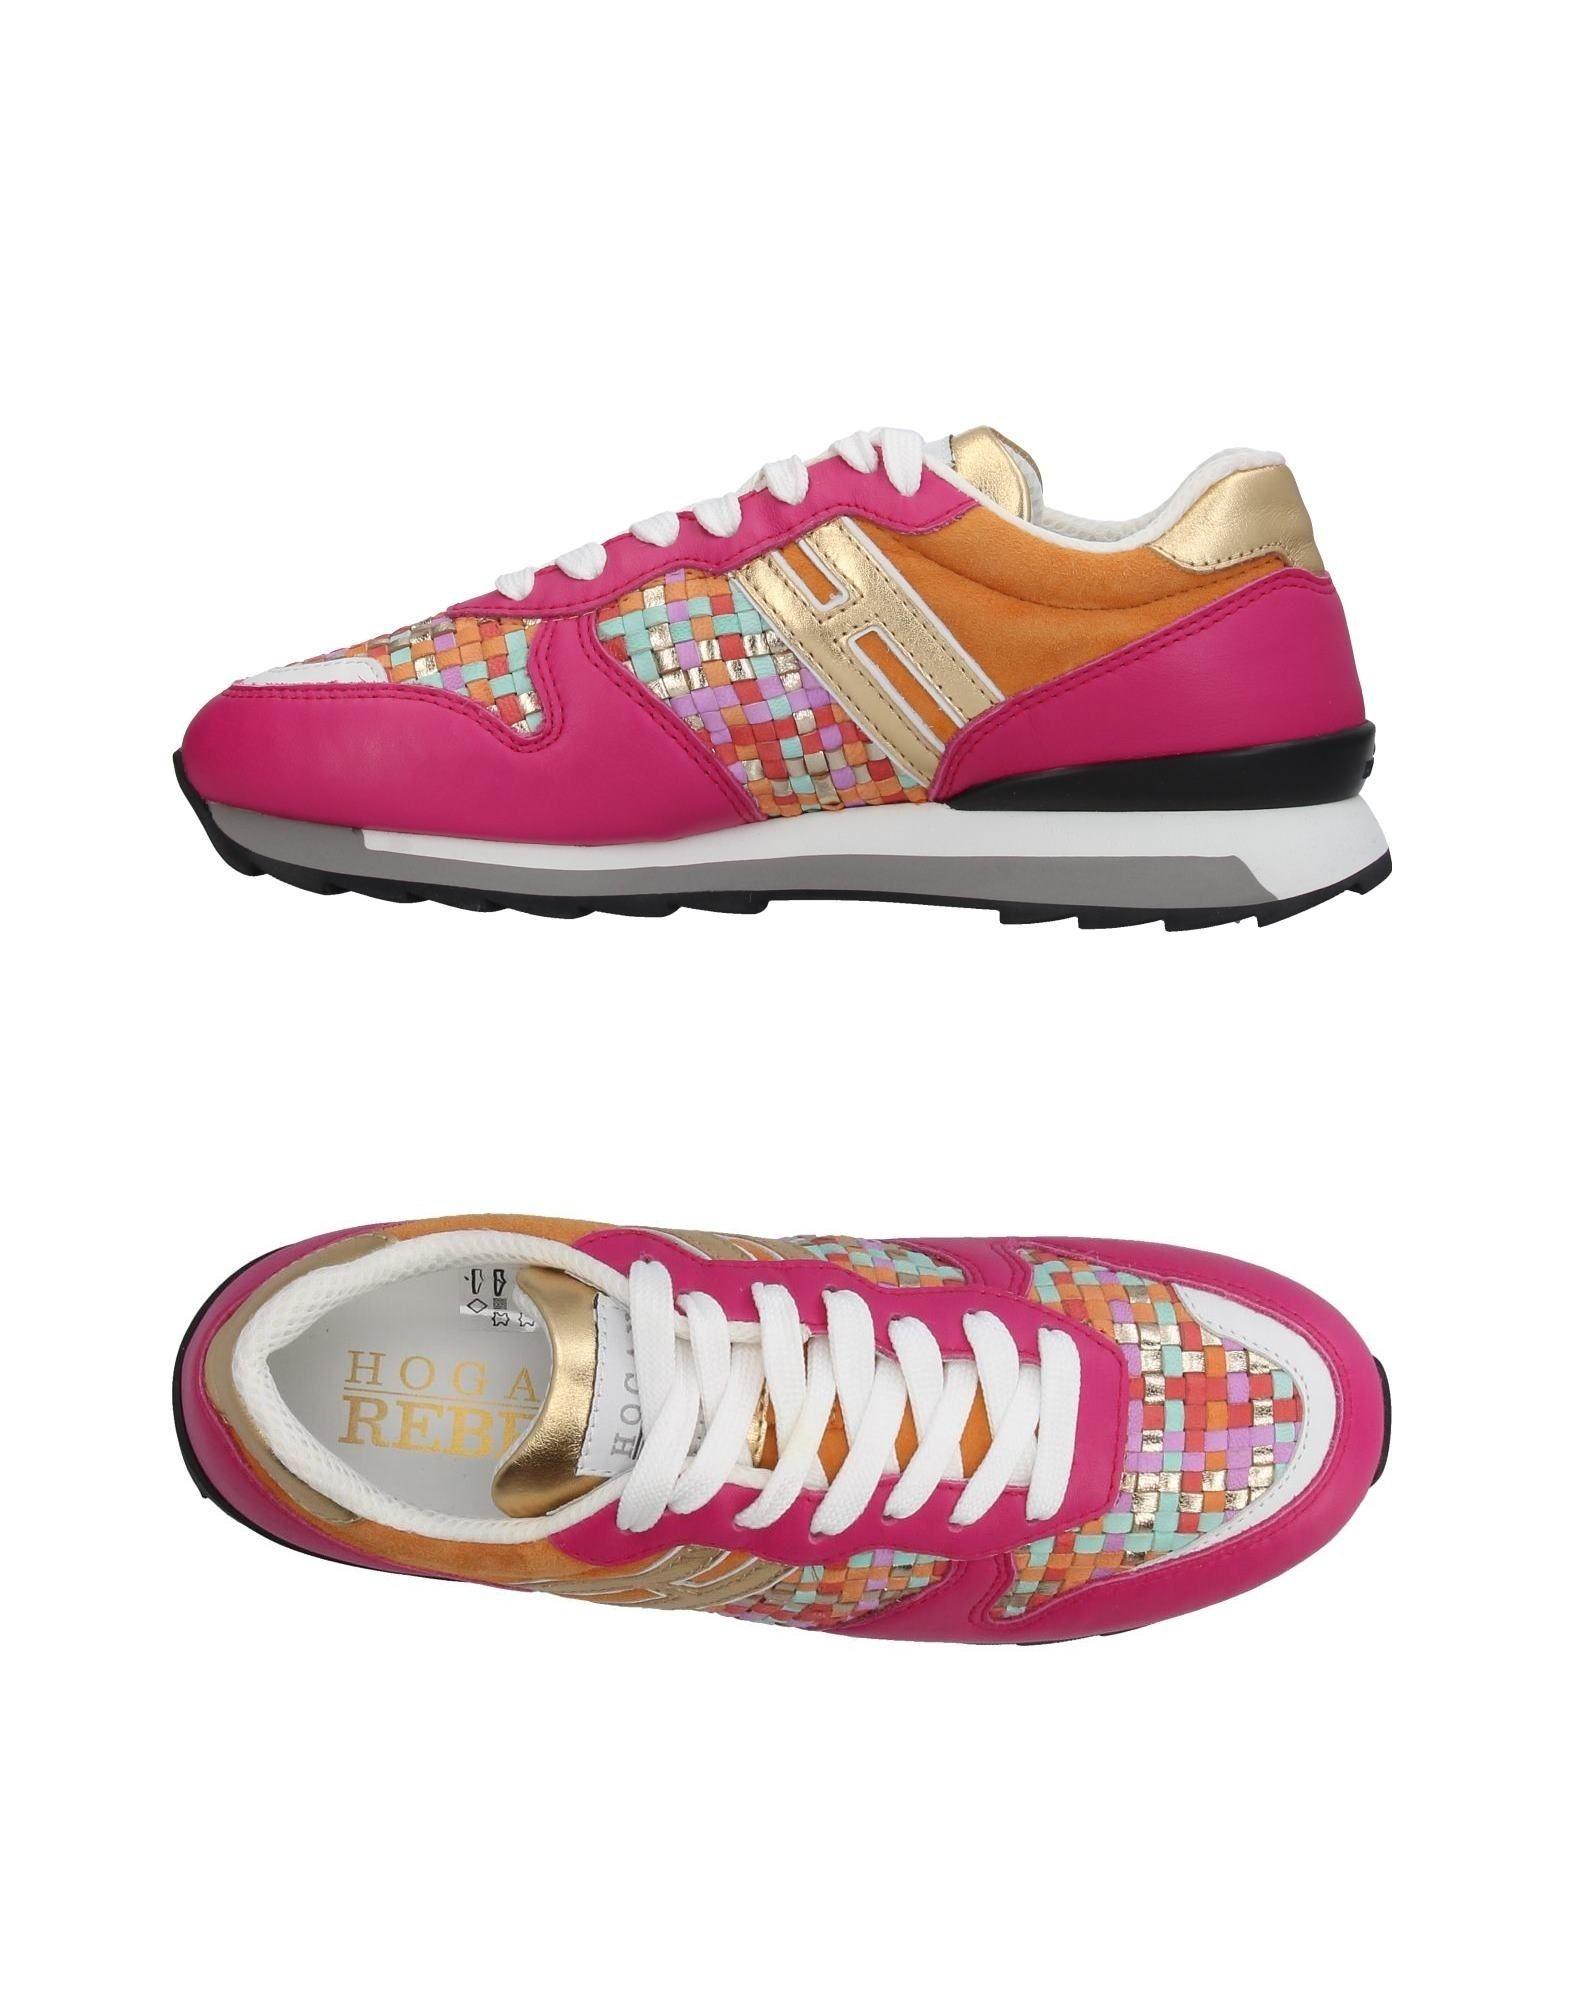 Hogan Rebel Sneakers Damen  11396064HBGut aussehende strapazierfähige Schuhe